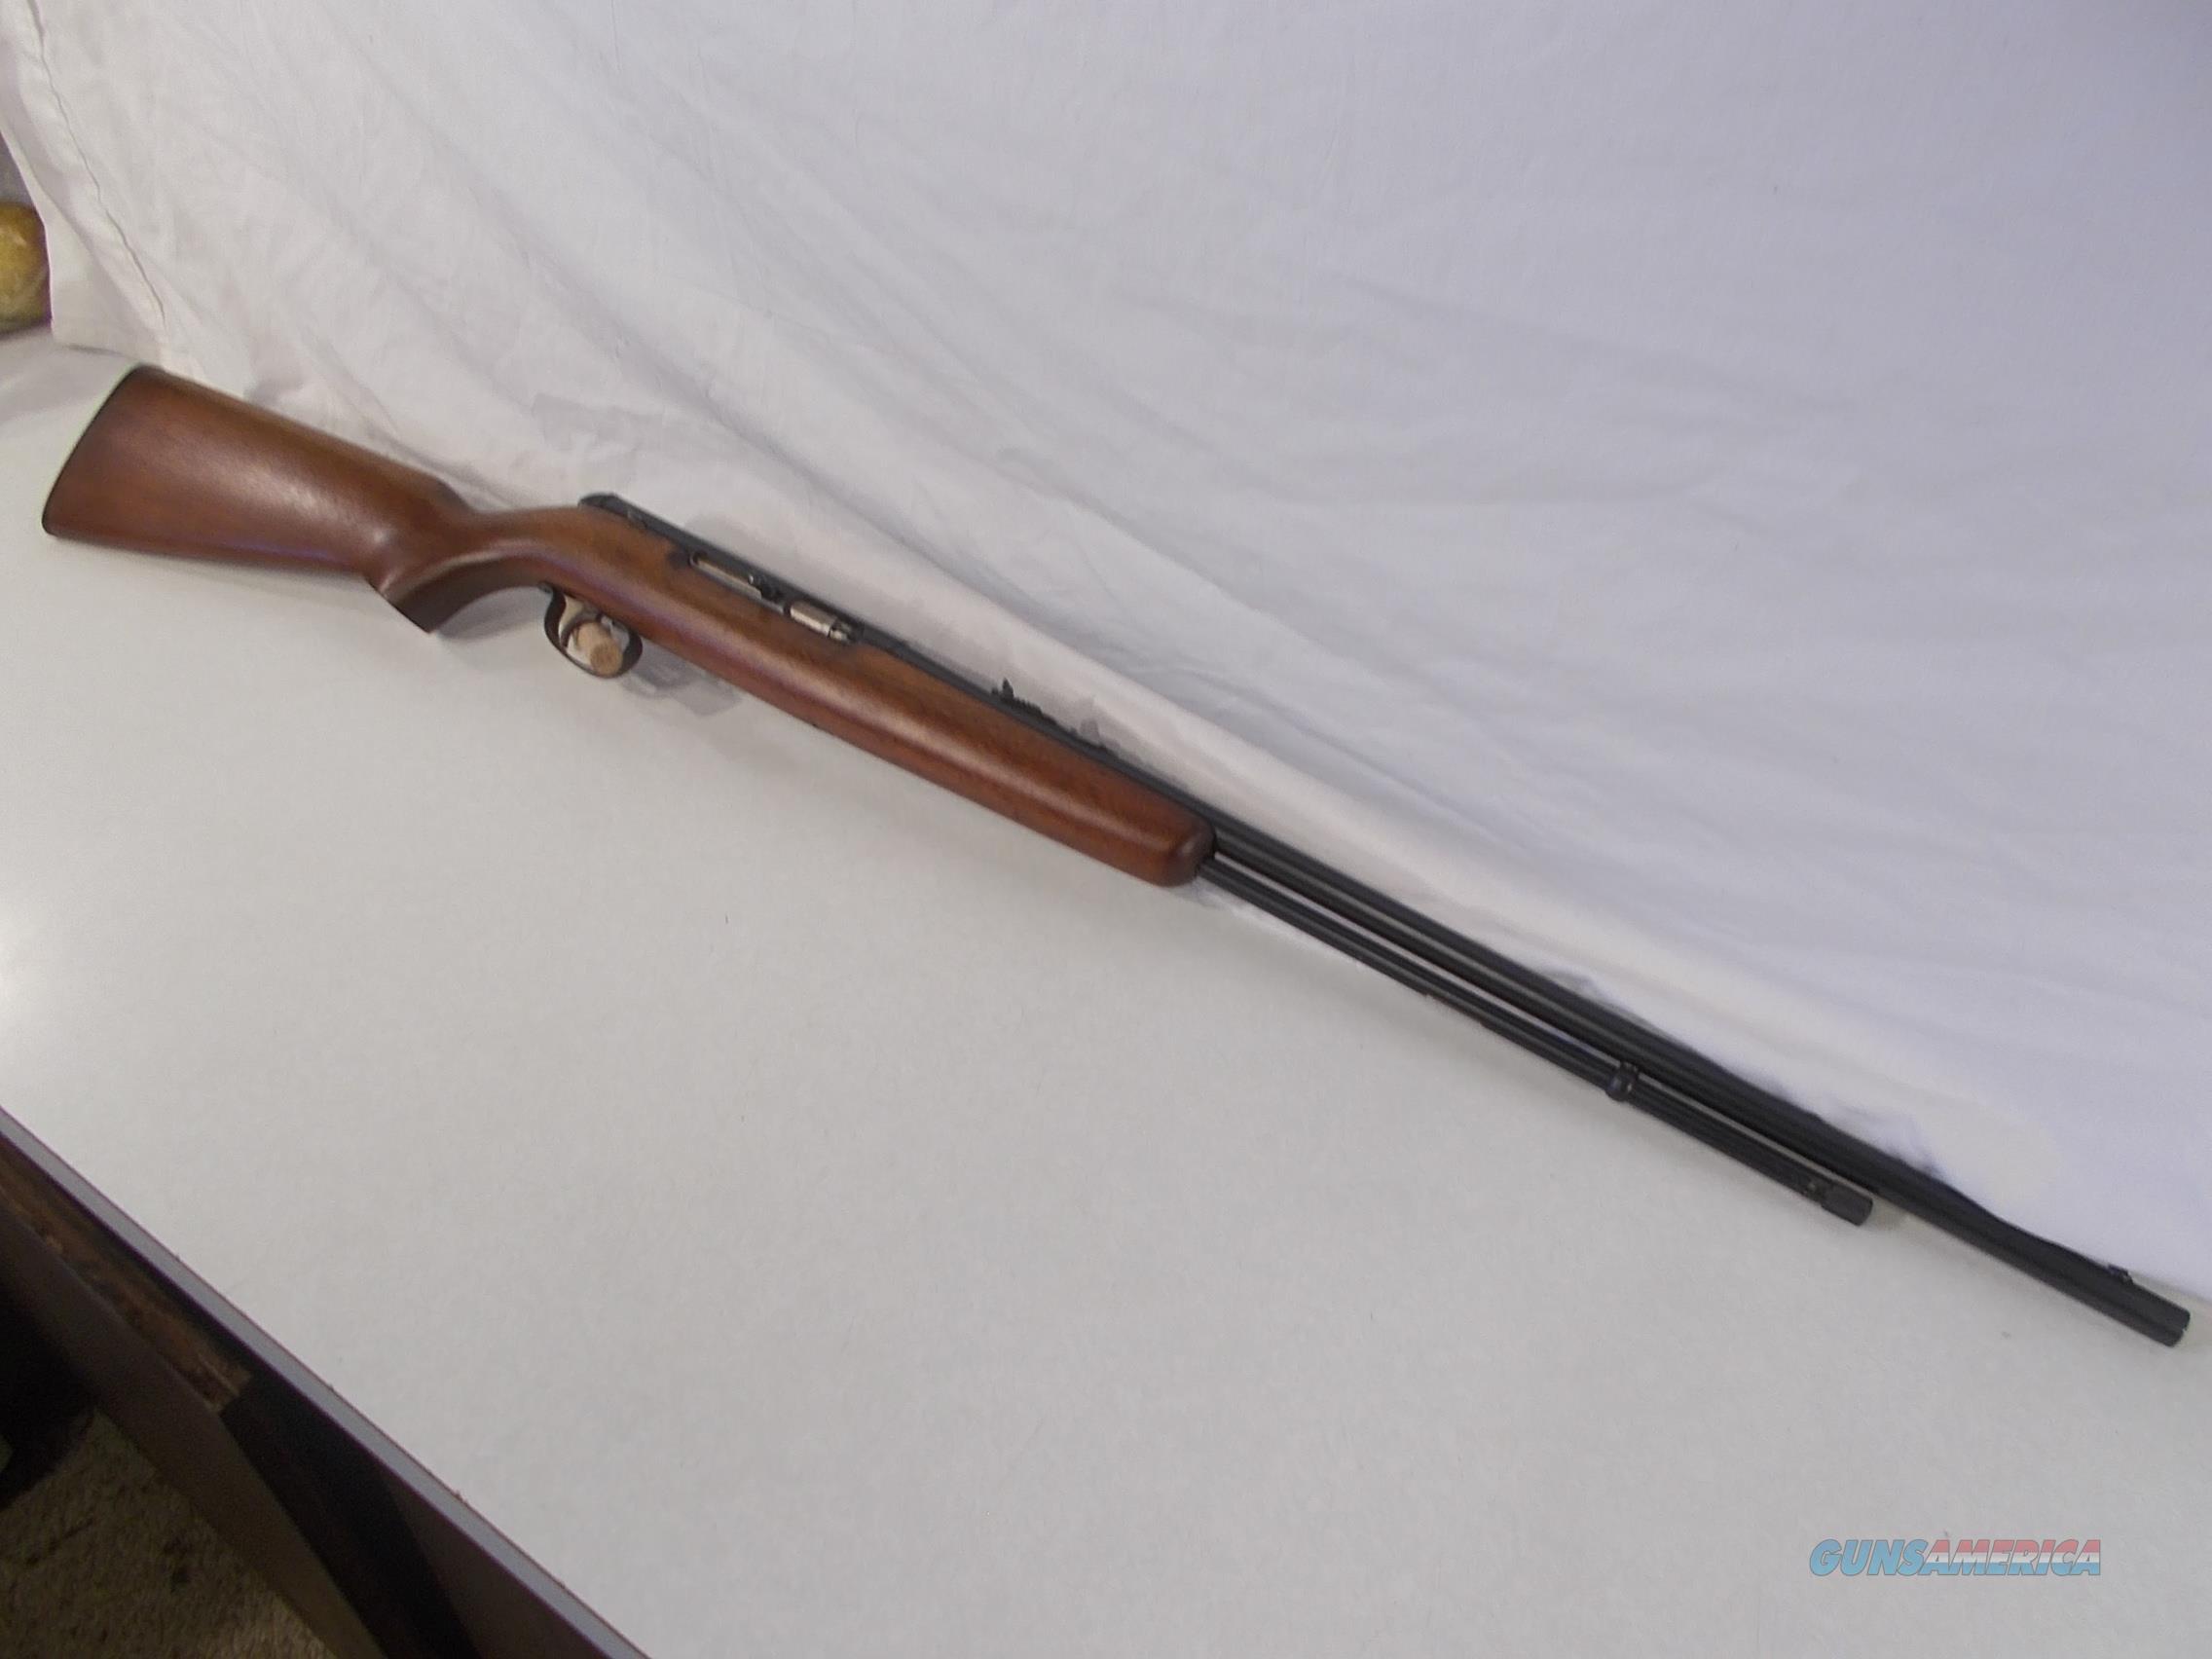 remington semiauto 22lr mod.550-1  Guns > Rifles > Remington Rifles - Modern > .22 Rimfire Models